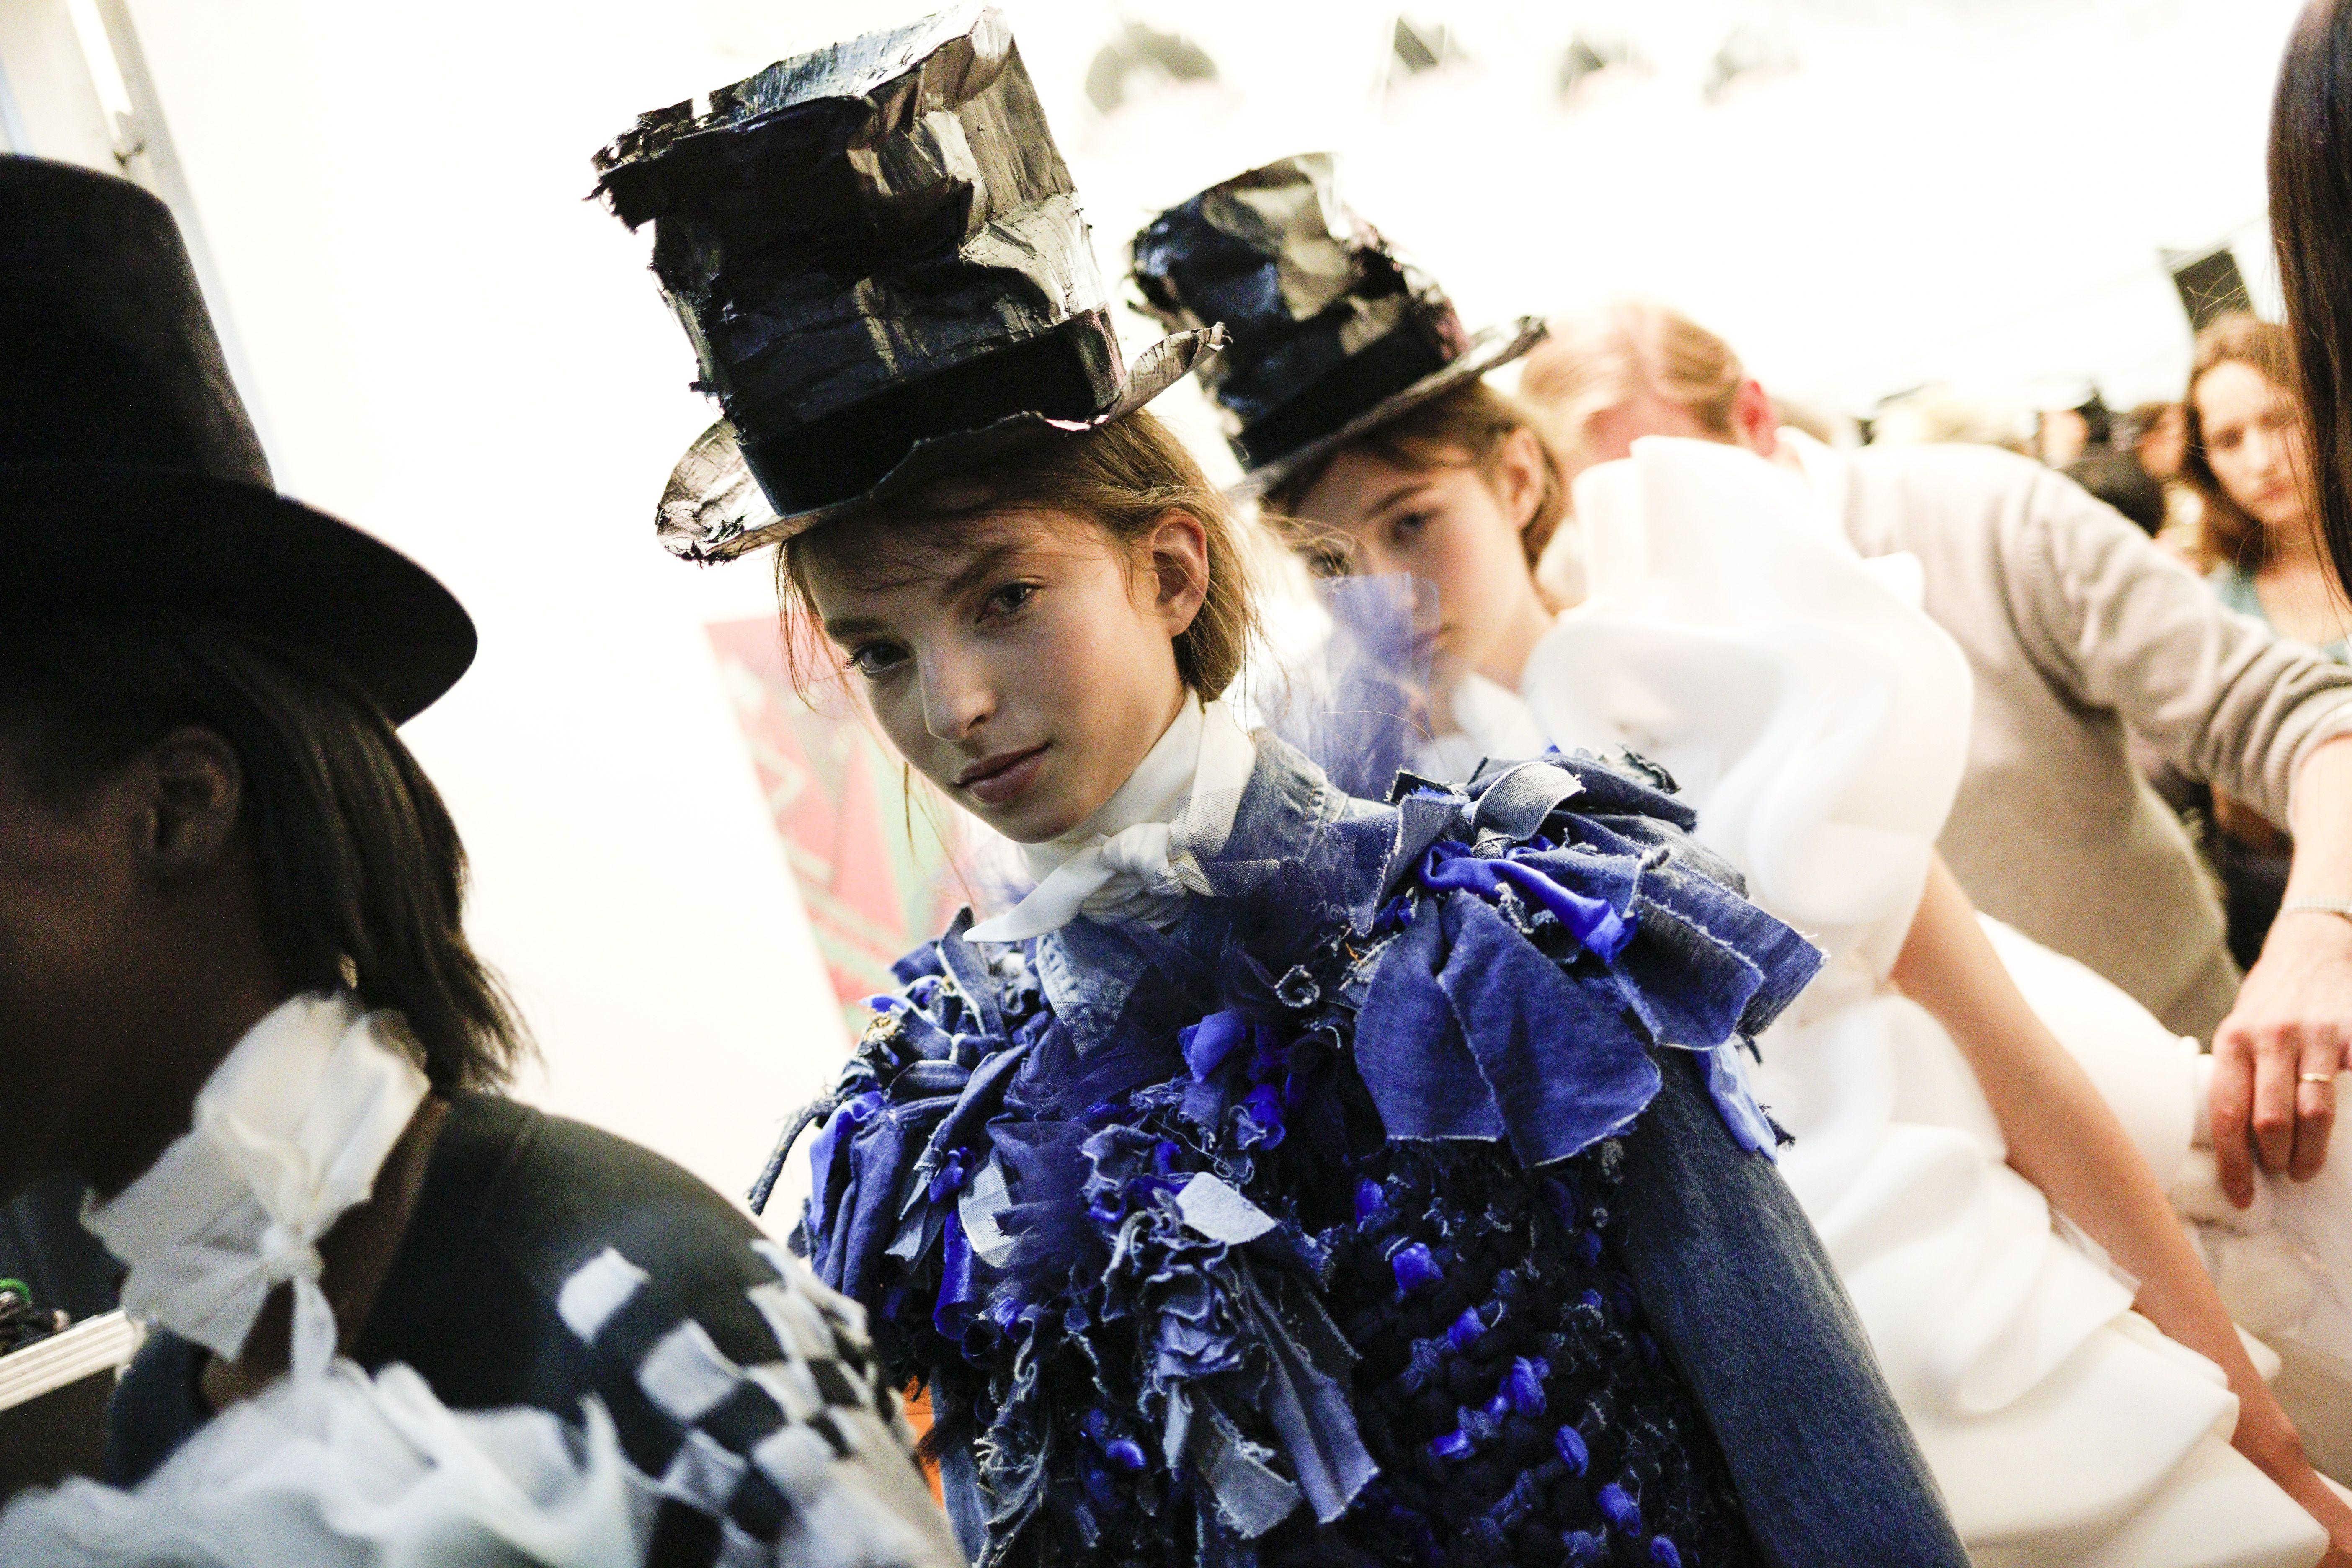 Viktor&Rolf, Vagabonds, Haute Couture, Autumn/Winter 2016, Backstage Fashion